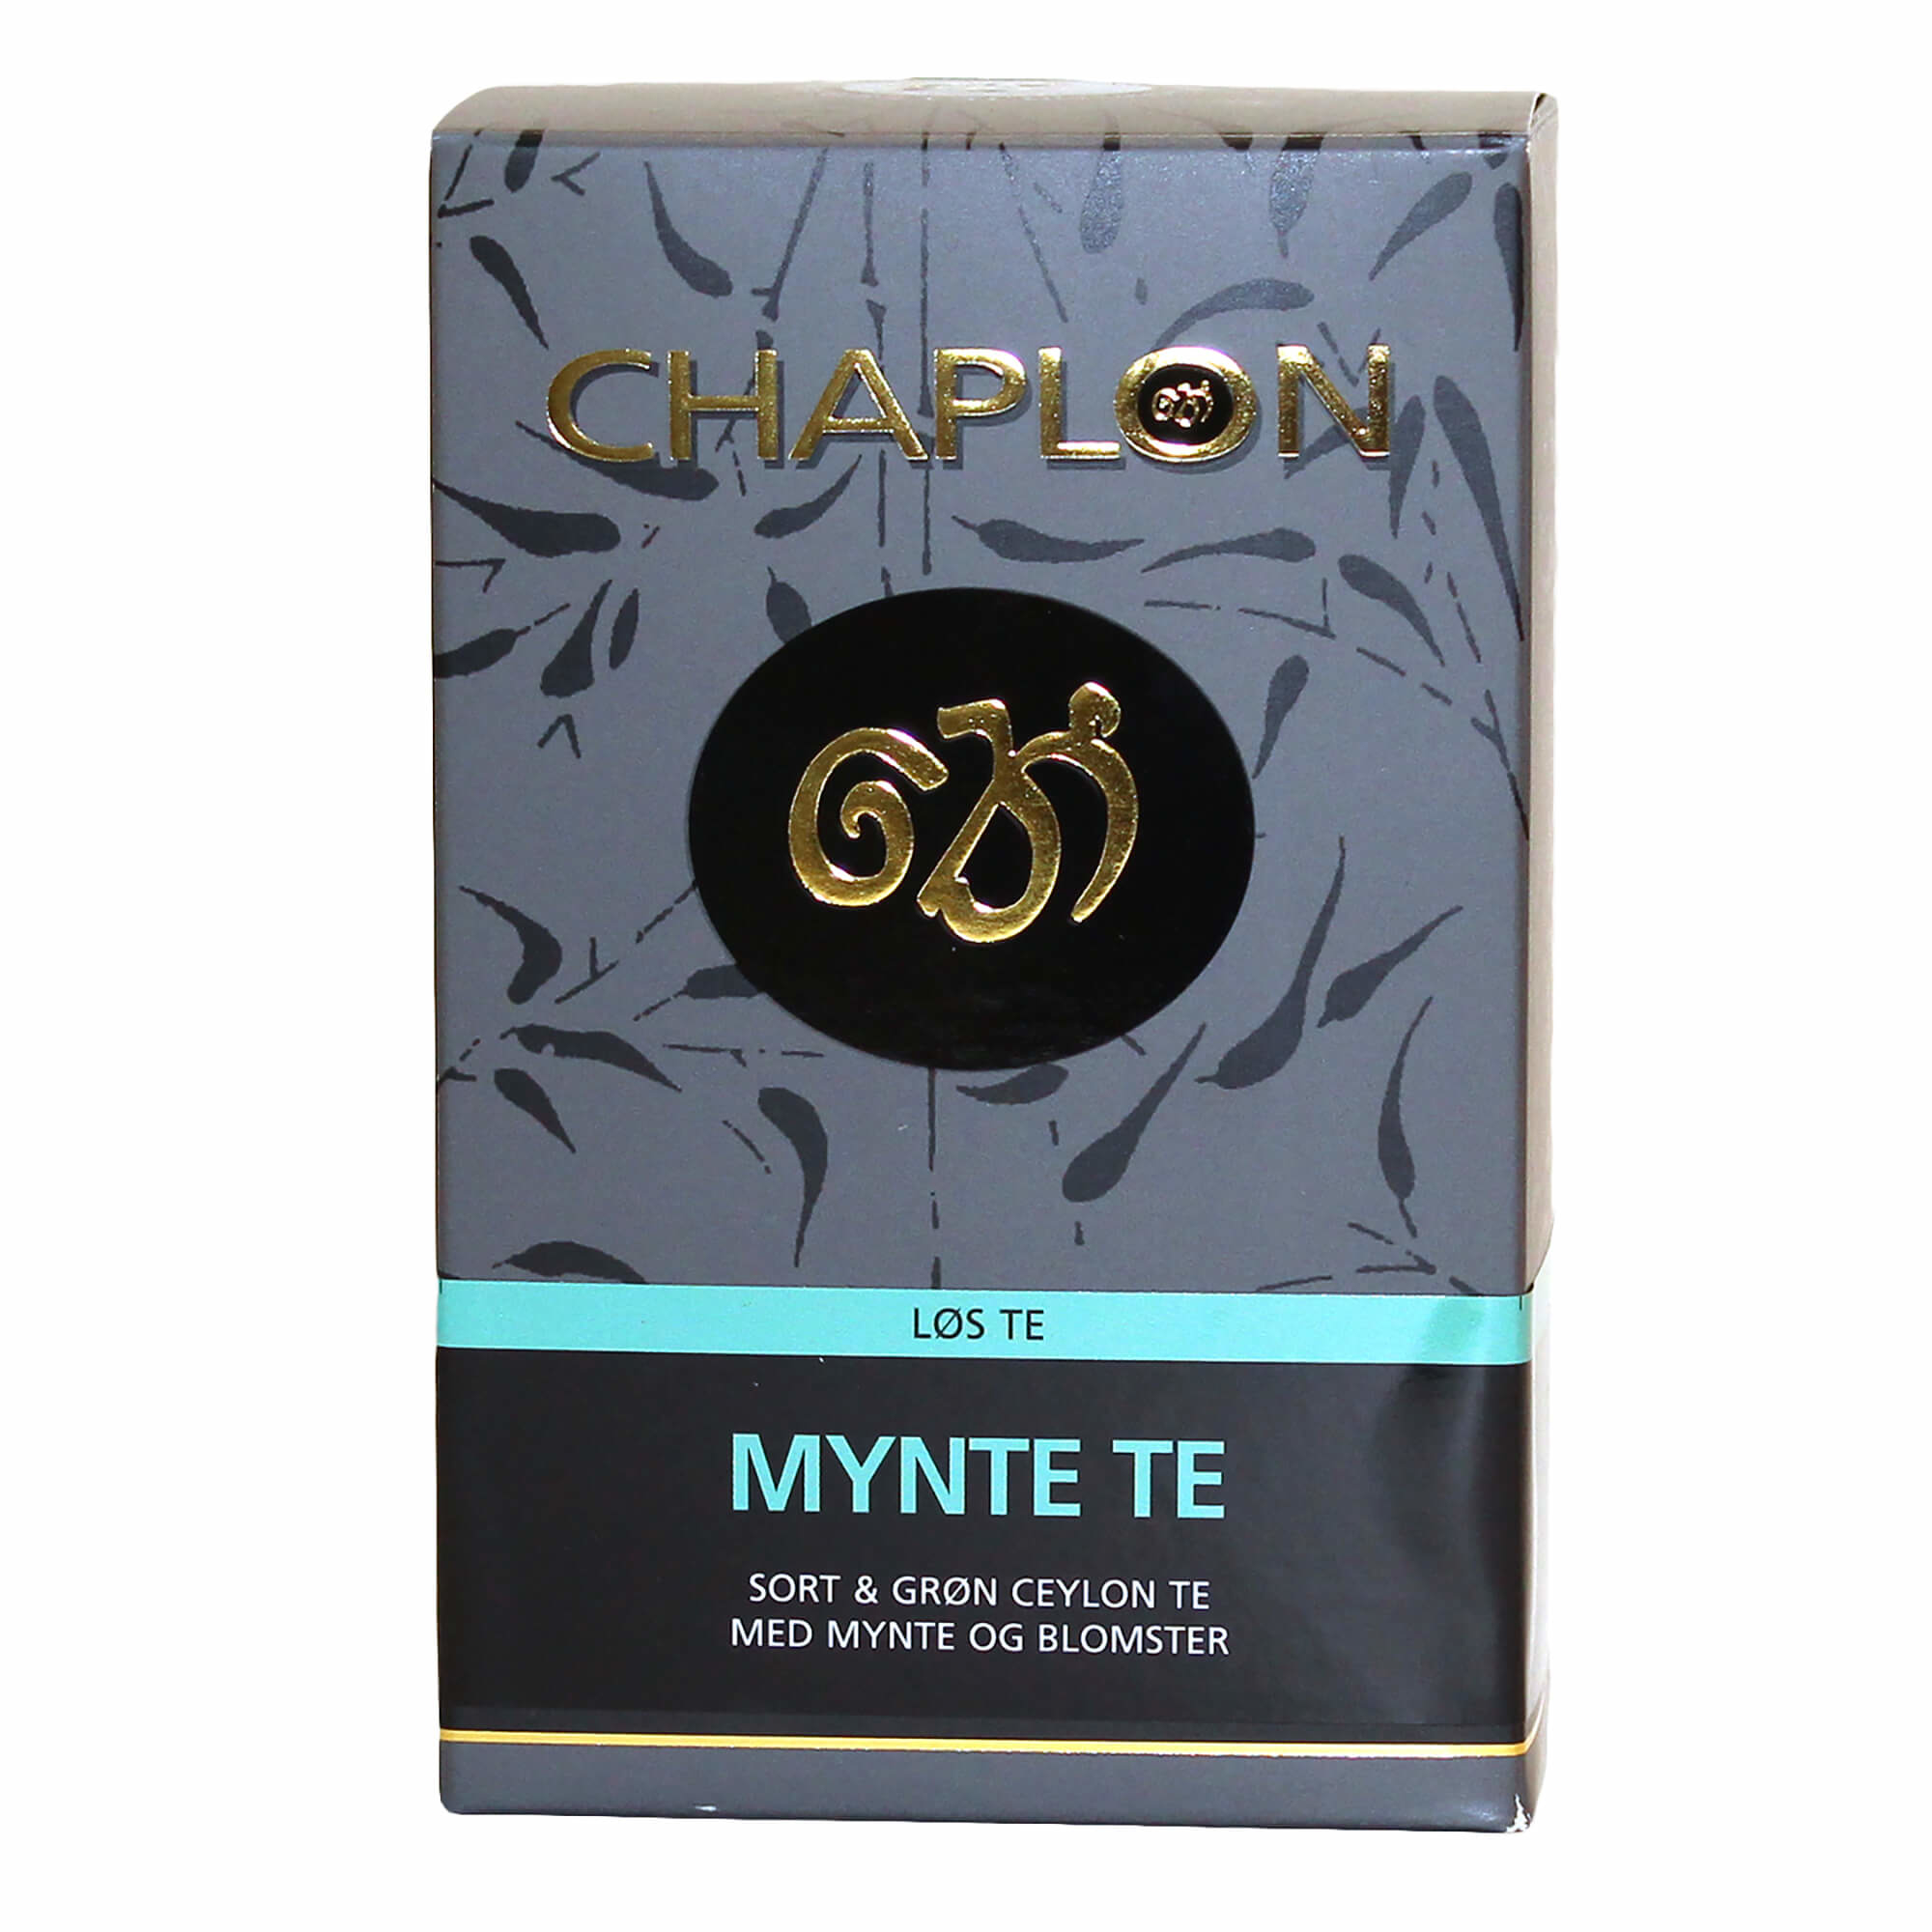 Image of   Chaplon Mynte Te - 100 gram løs te